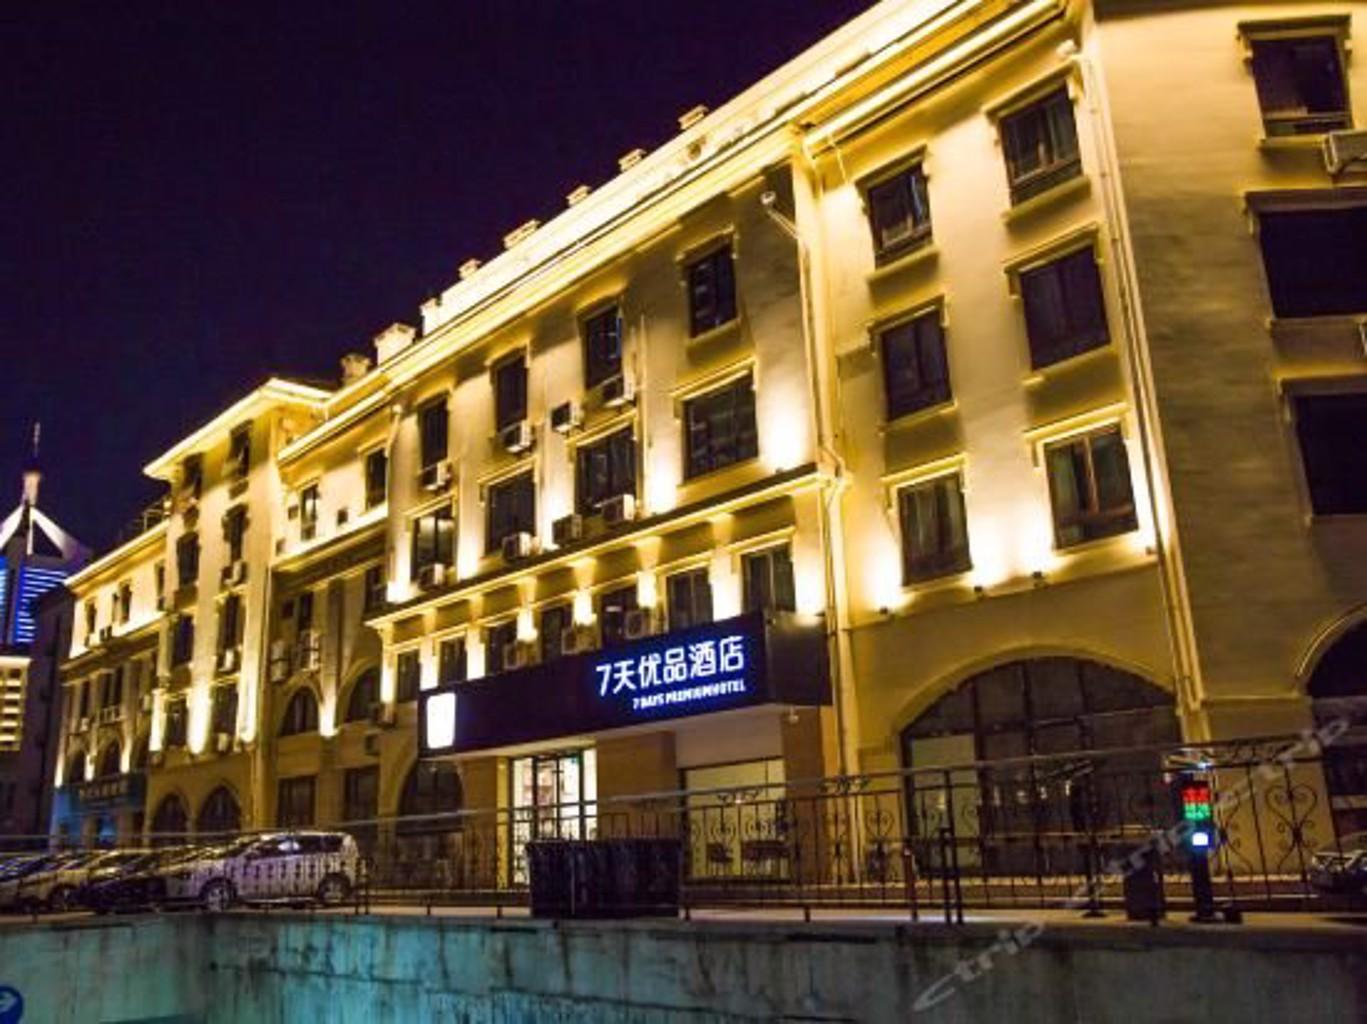 7 Days Inn Qingdao Development Area Jinggangshan Road